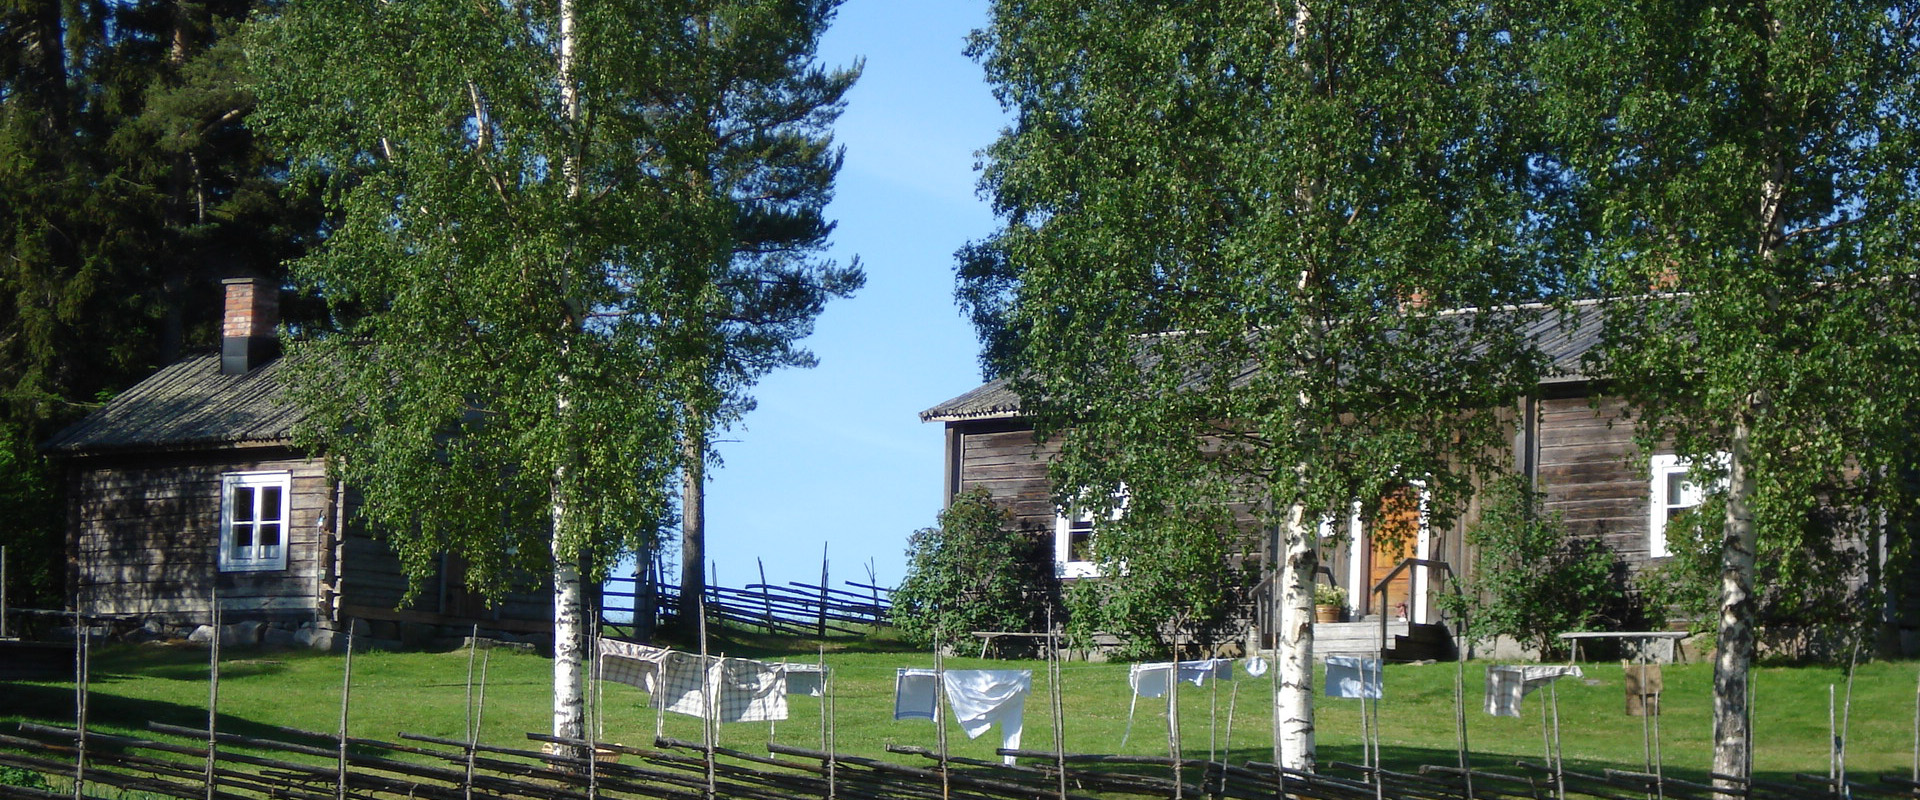 Pehrsgårdens utemiljö Swensbylijda